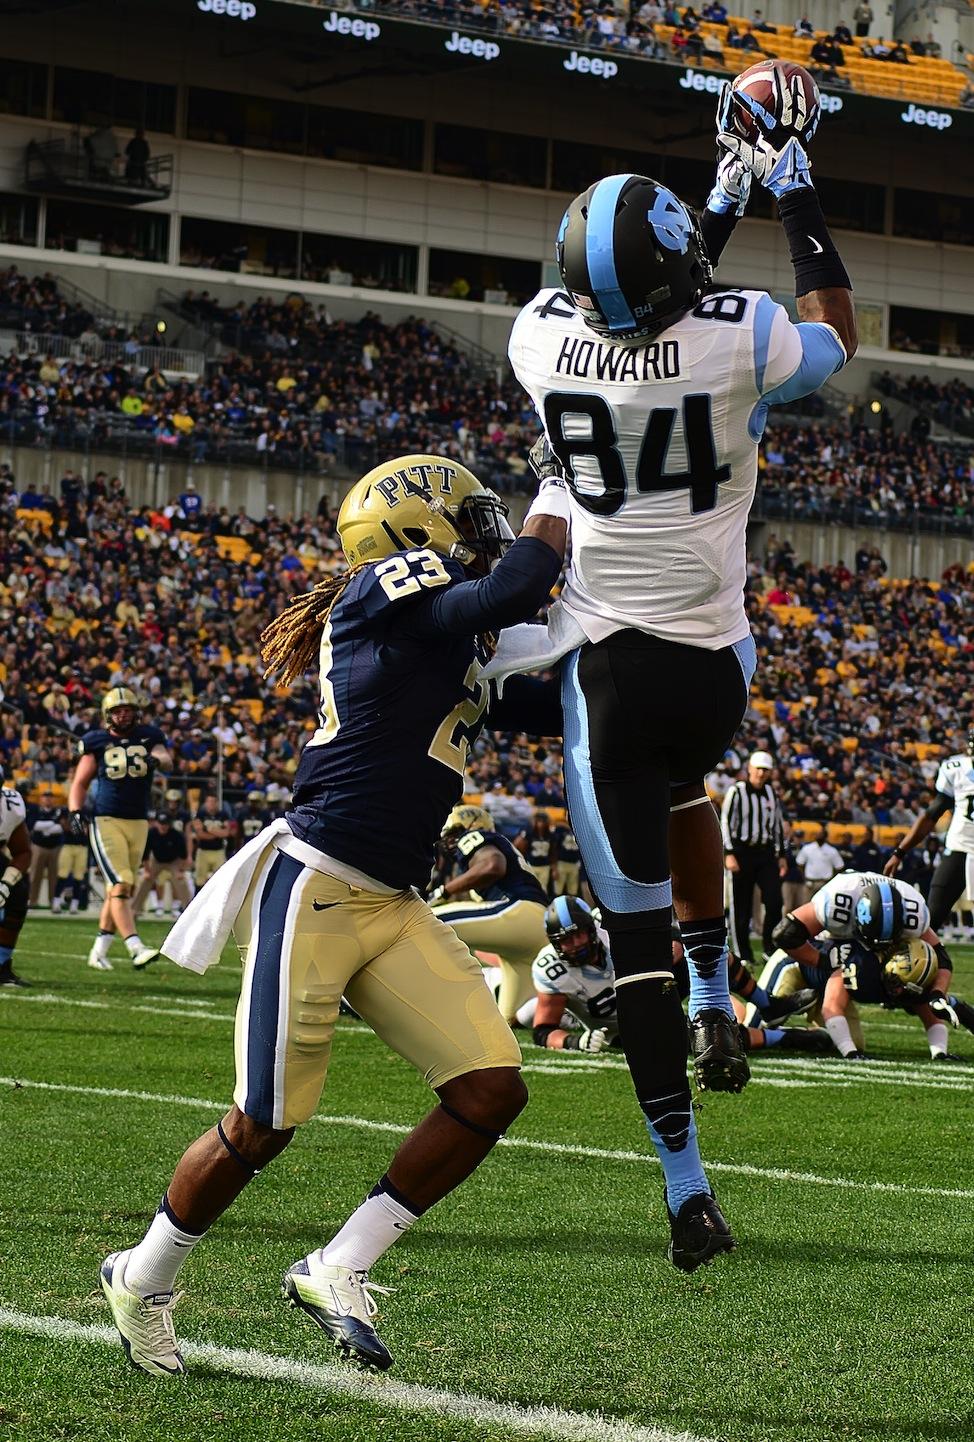 Pitt vs. UNC